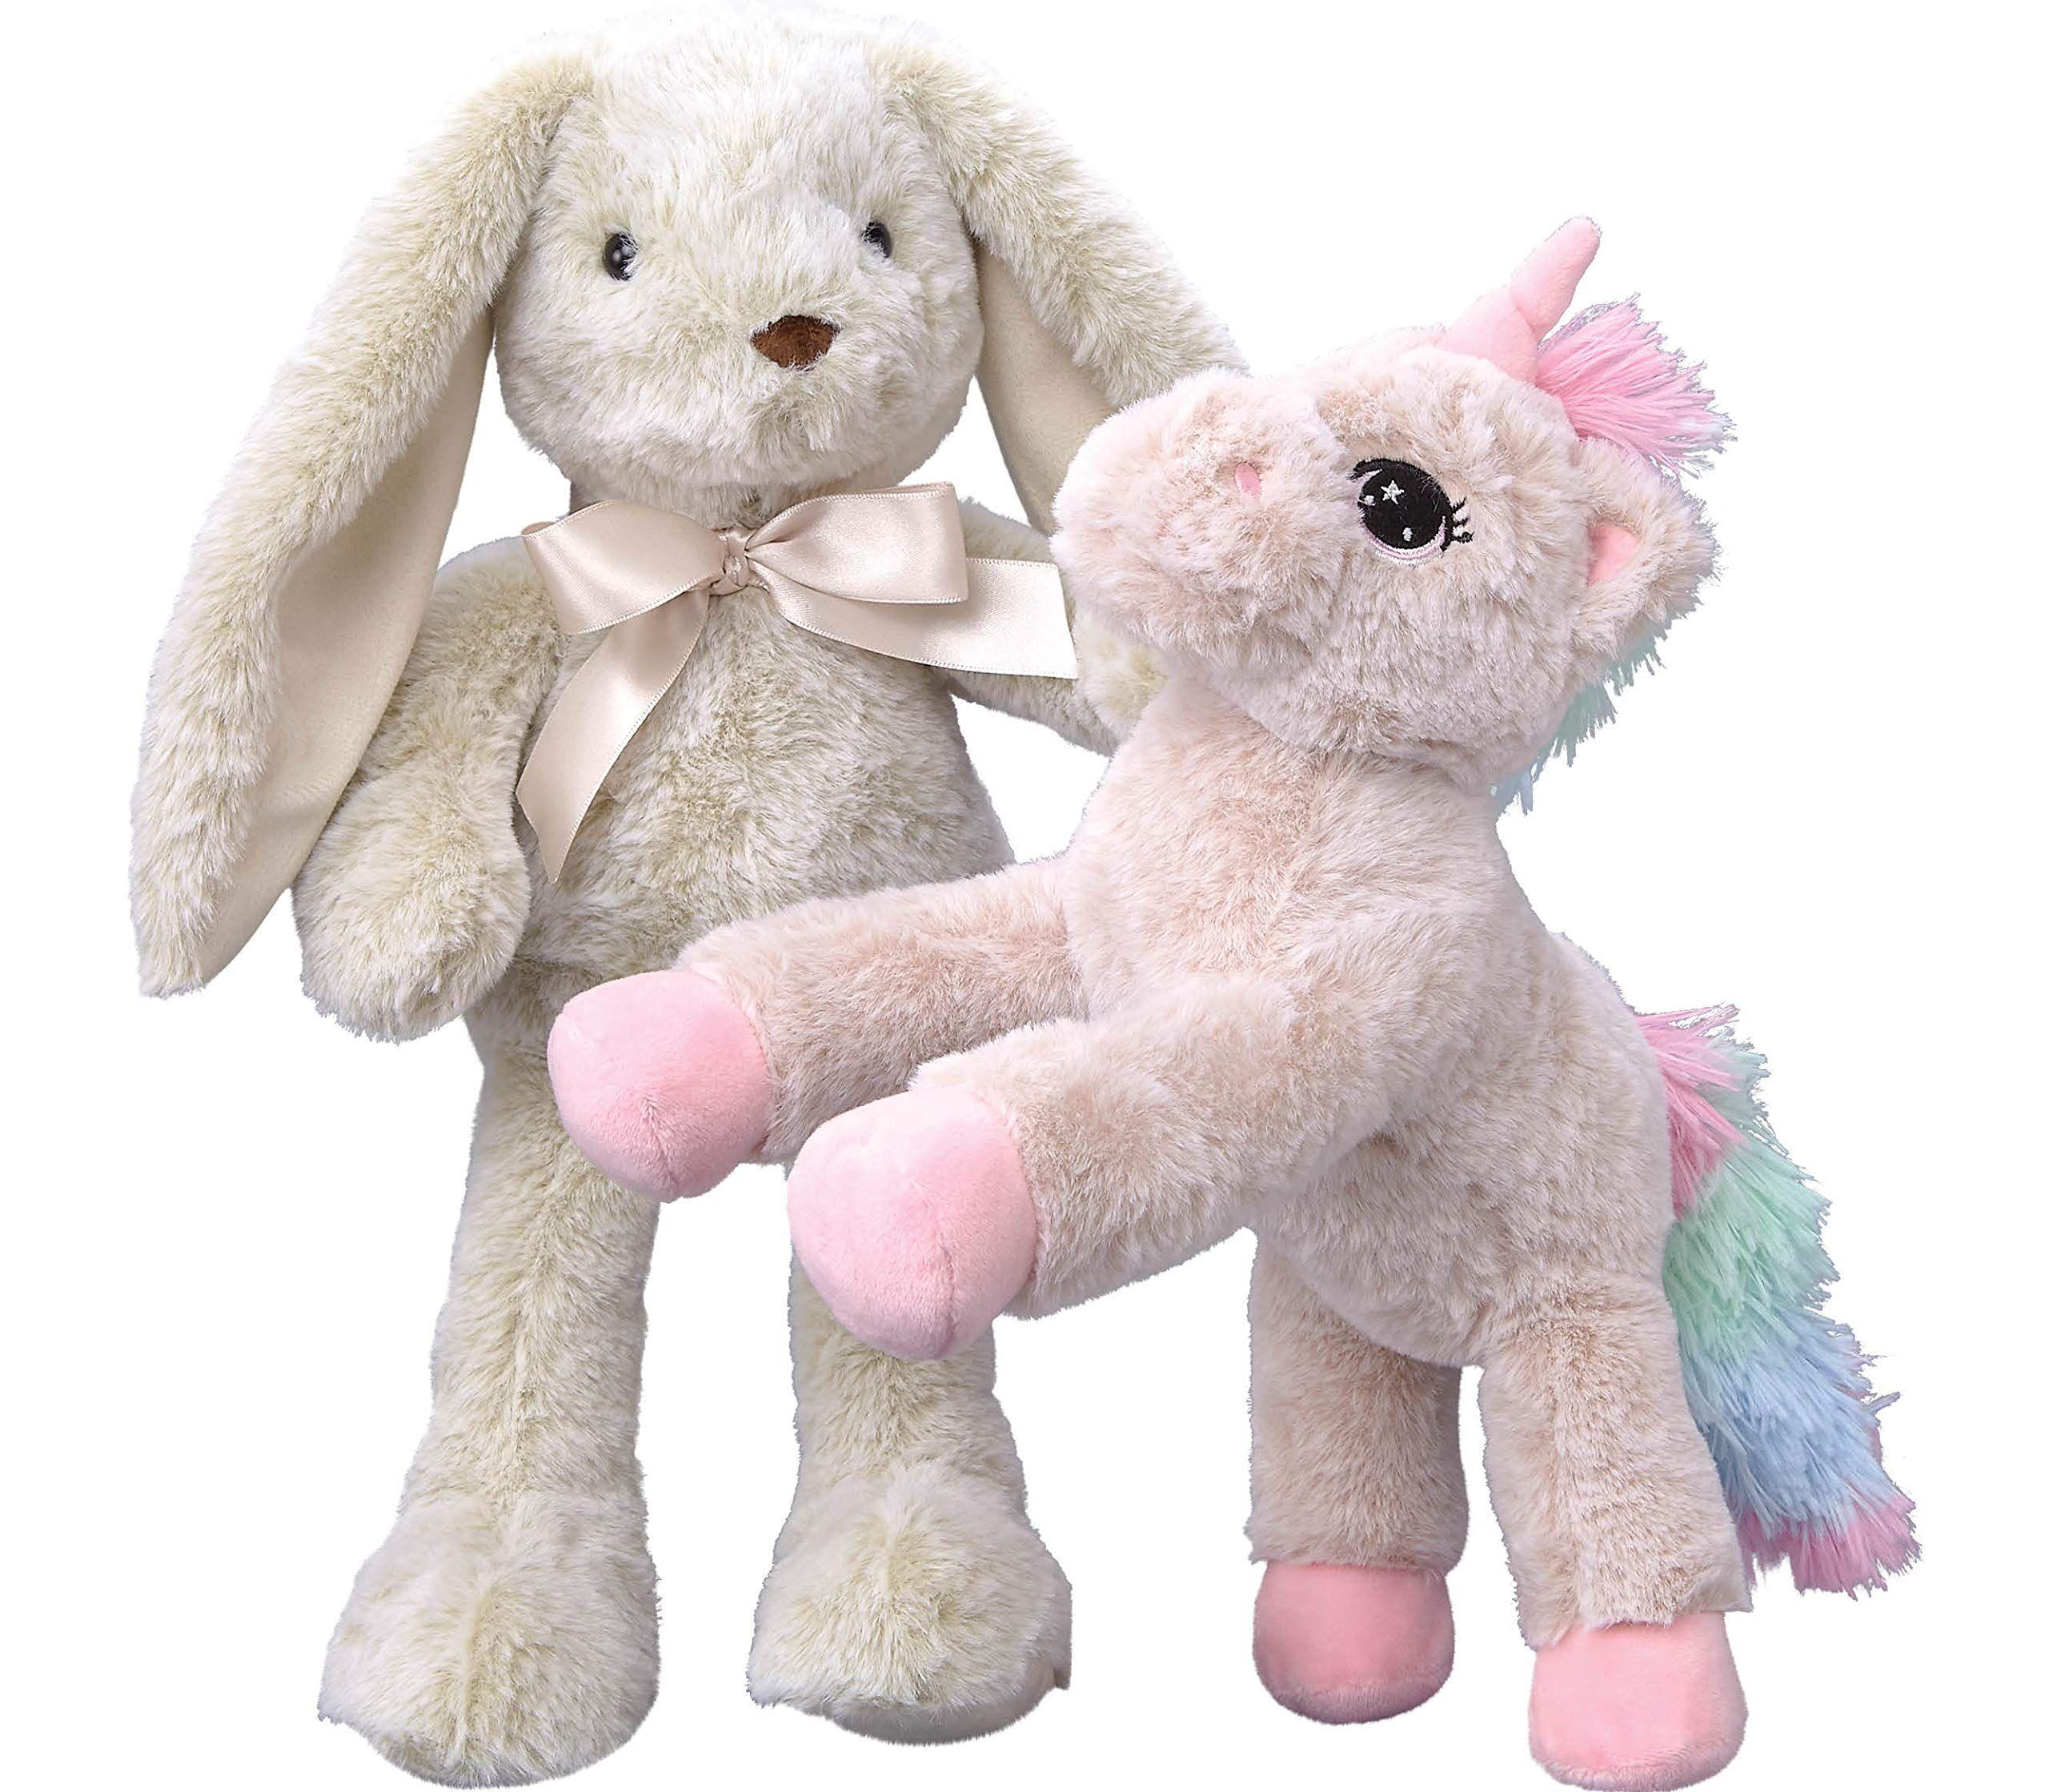 Predownload: Dragon Drew Unicorn And Bunny Stuffed Animals 2 Soft Plush Animal Toys For Baby Toddler And Kids Cute An Bunny Stuffed Animals Animal Plush Toys Baby Toys [ 2239 x 2560 Pixel ]